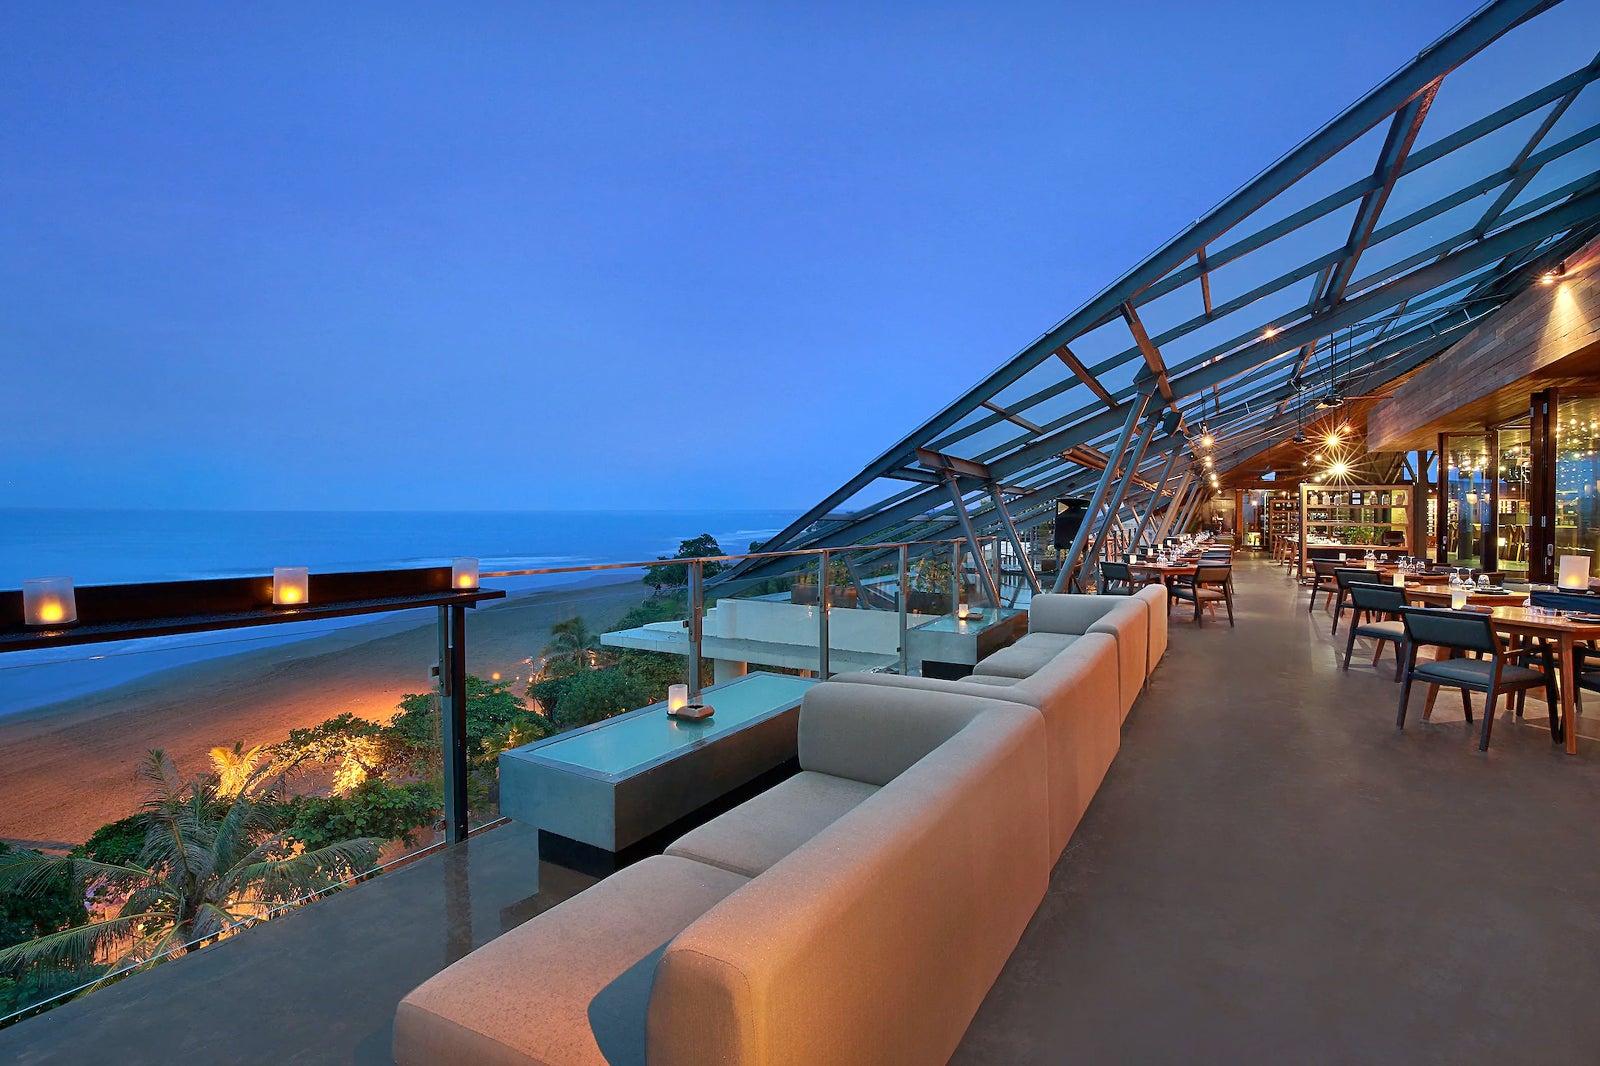 6 Best Rooftop Bars In Bali Bali S Best Rooftop Venues